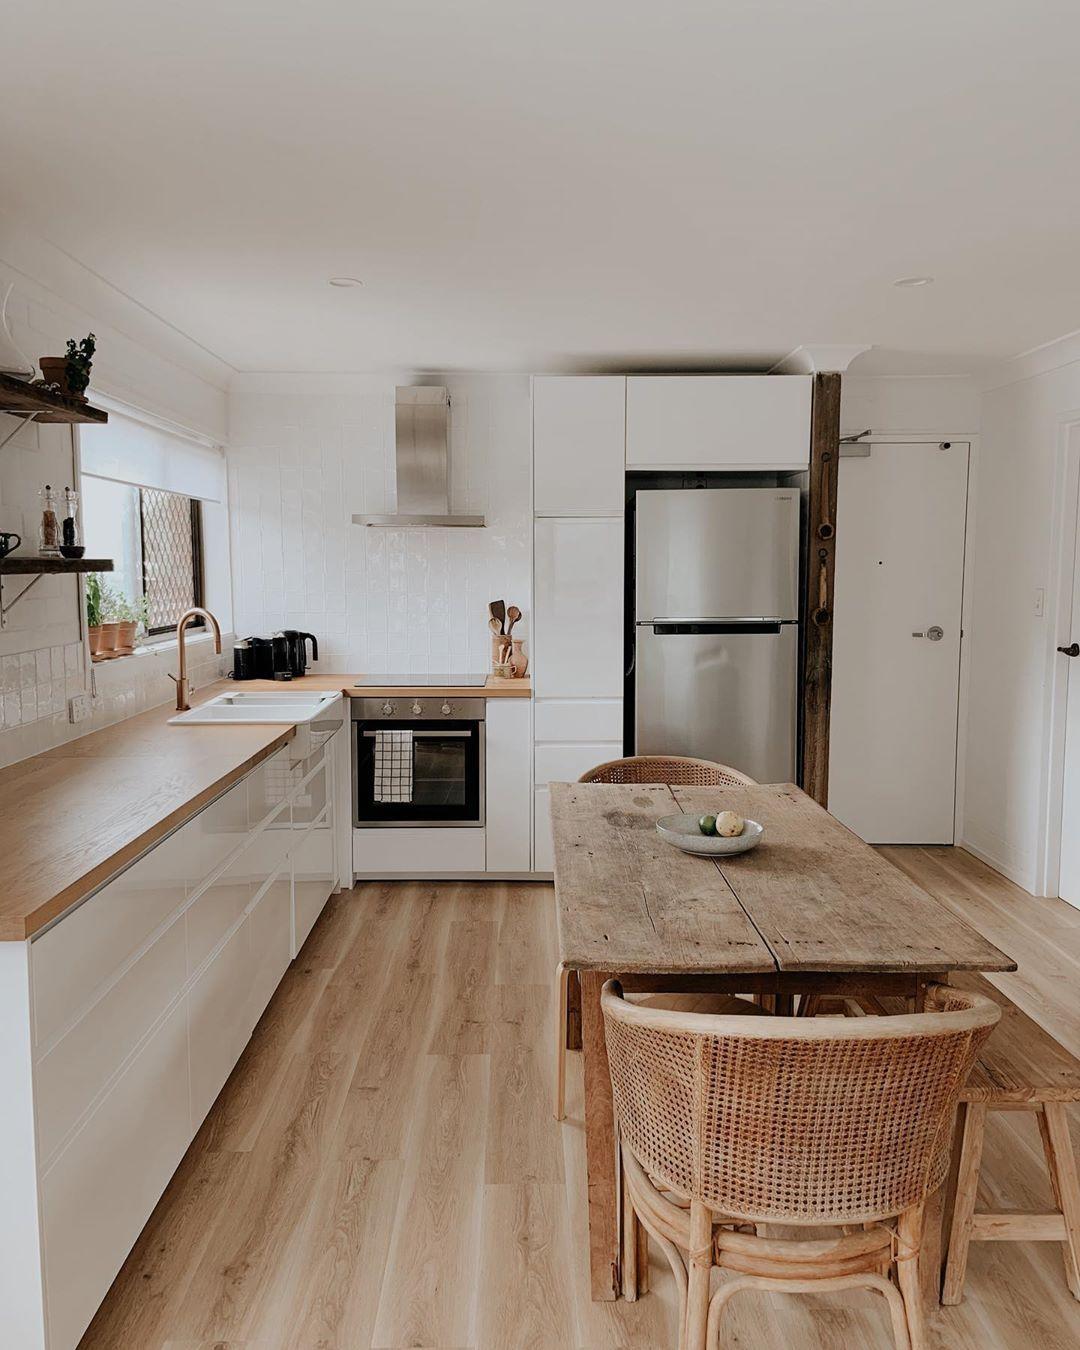 "Our Little Beachflat on Instagram: ""KITCHEN 〰️ Kitchen reno complete! #kitchenreno #reno #beachflat #kingscliff #home #diy #husbandandwifeteam #ateam"""